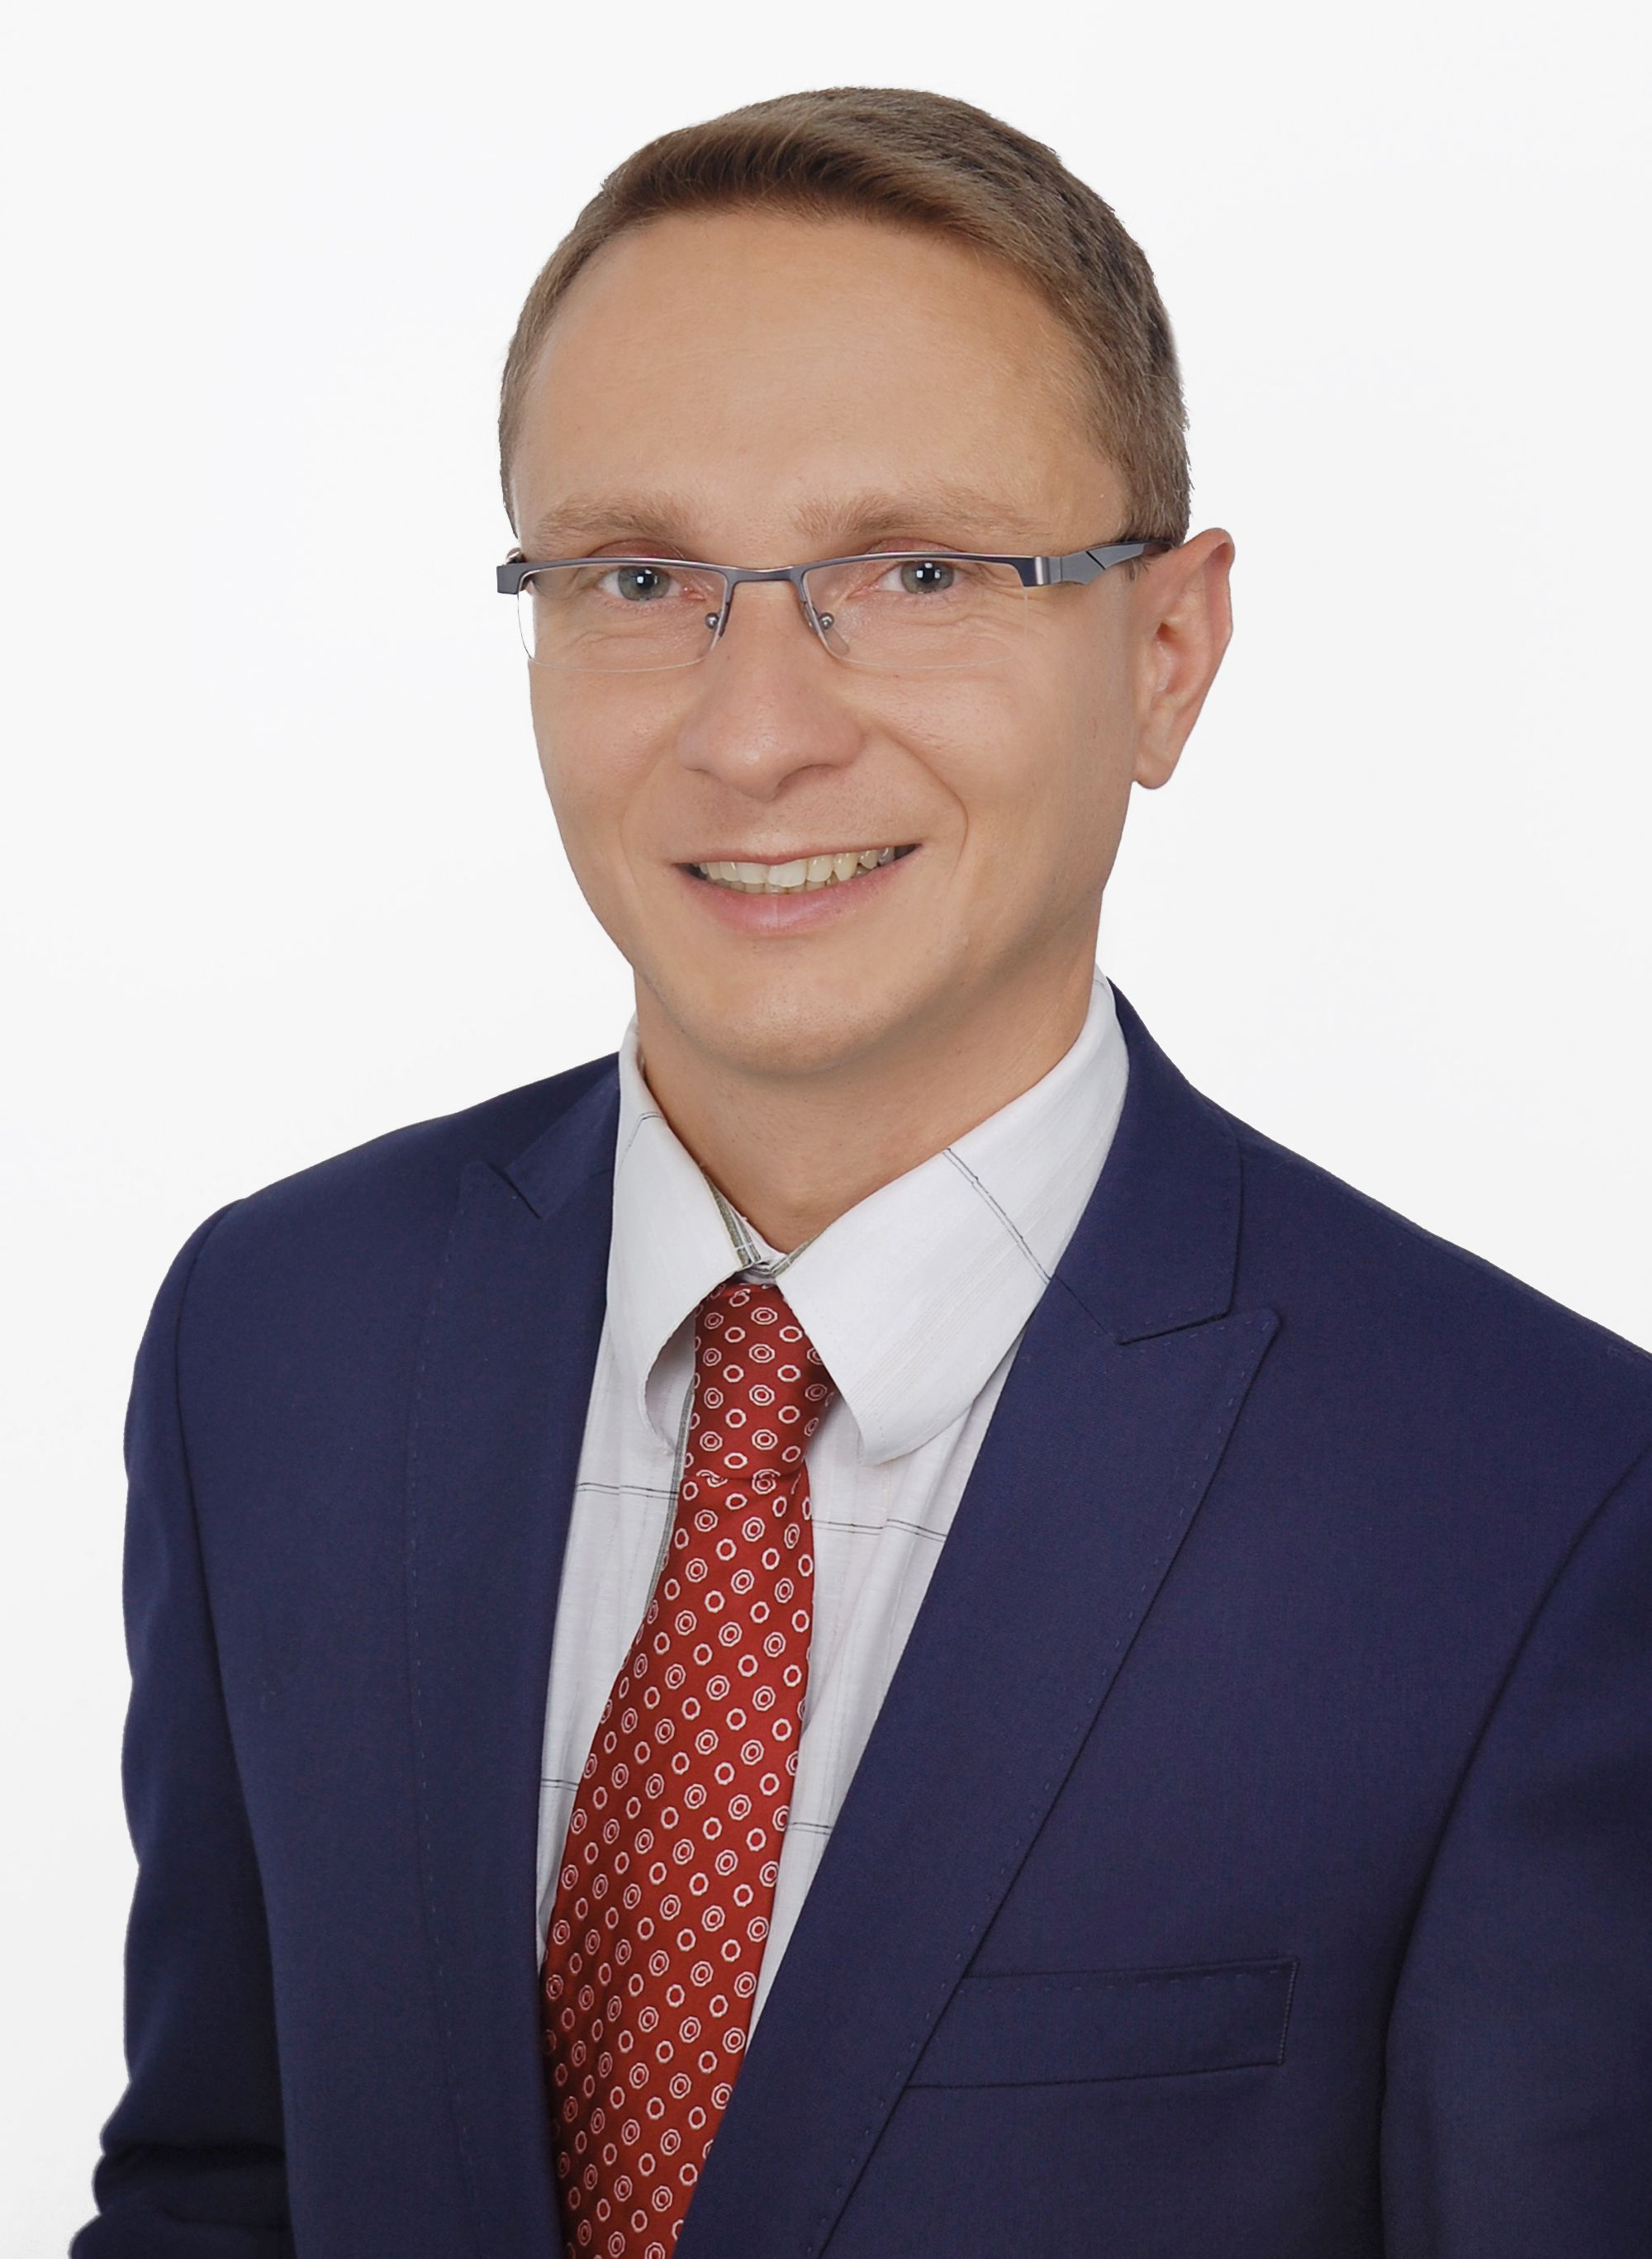 Piotr Uruski